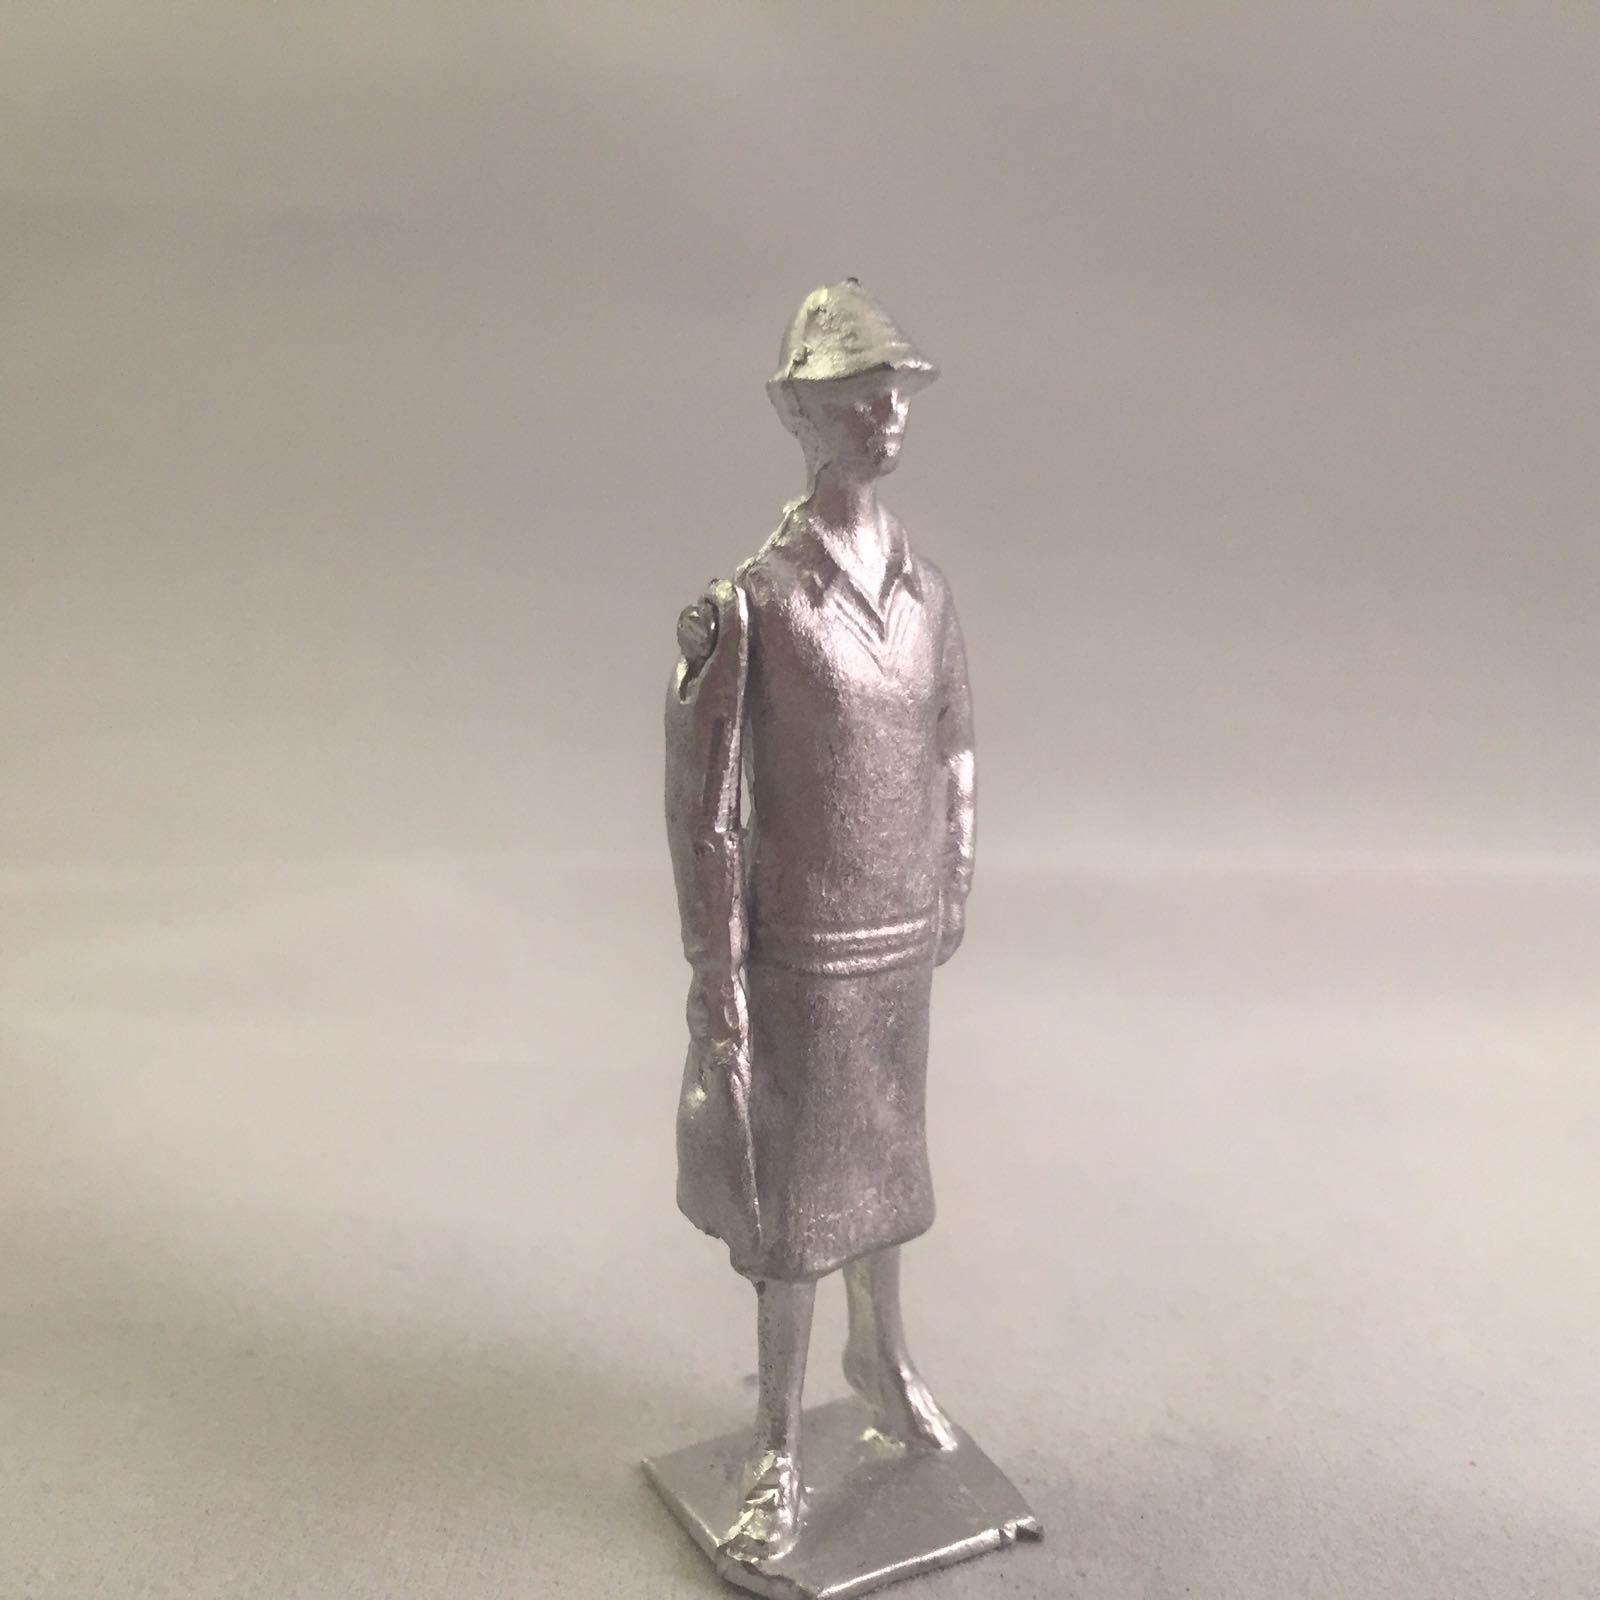 B21. Walking lady (1920s Flapper)